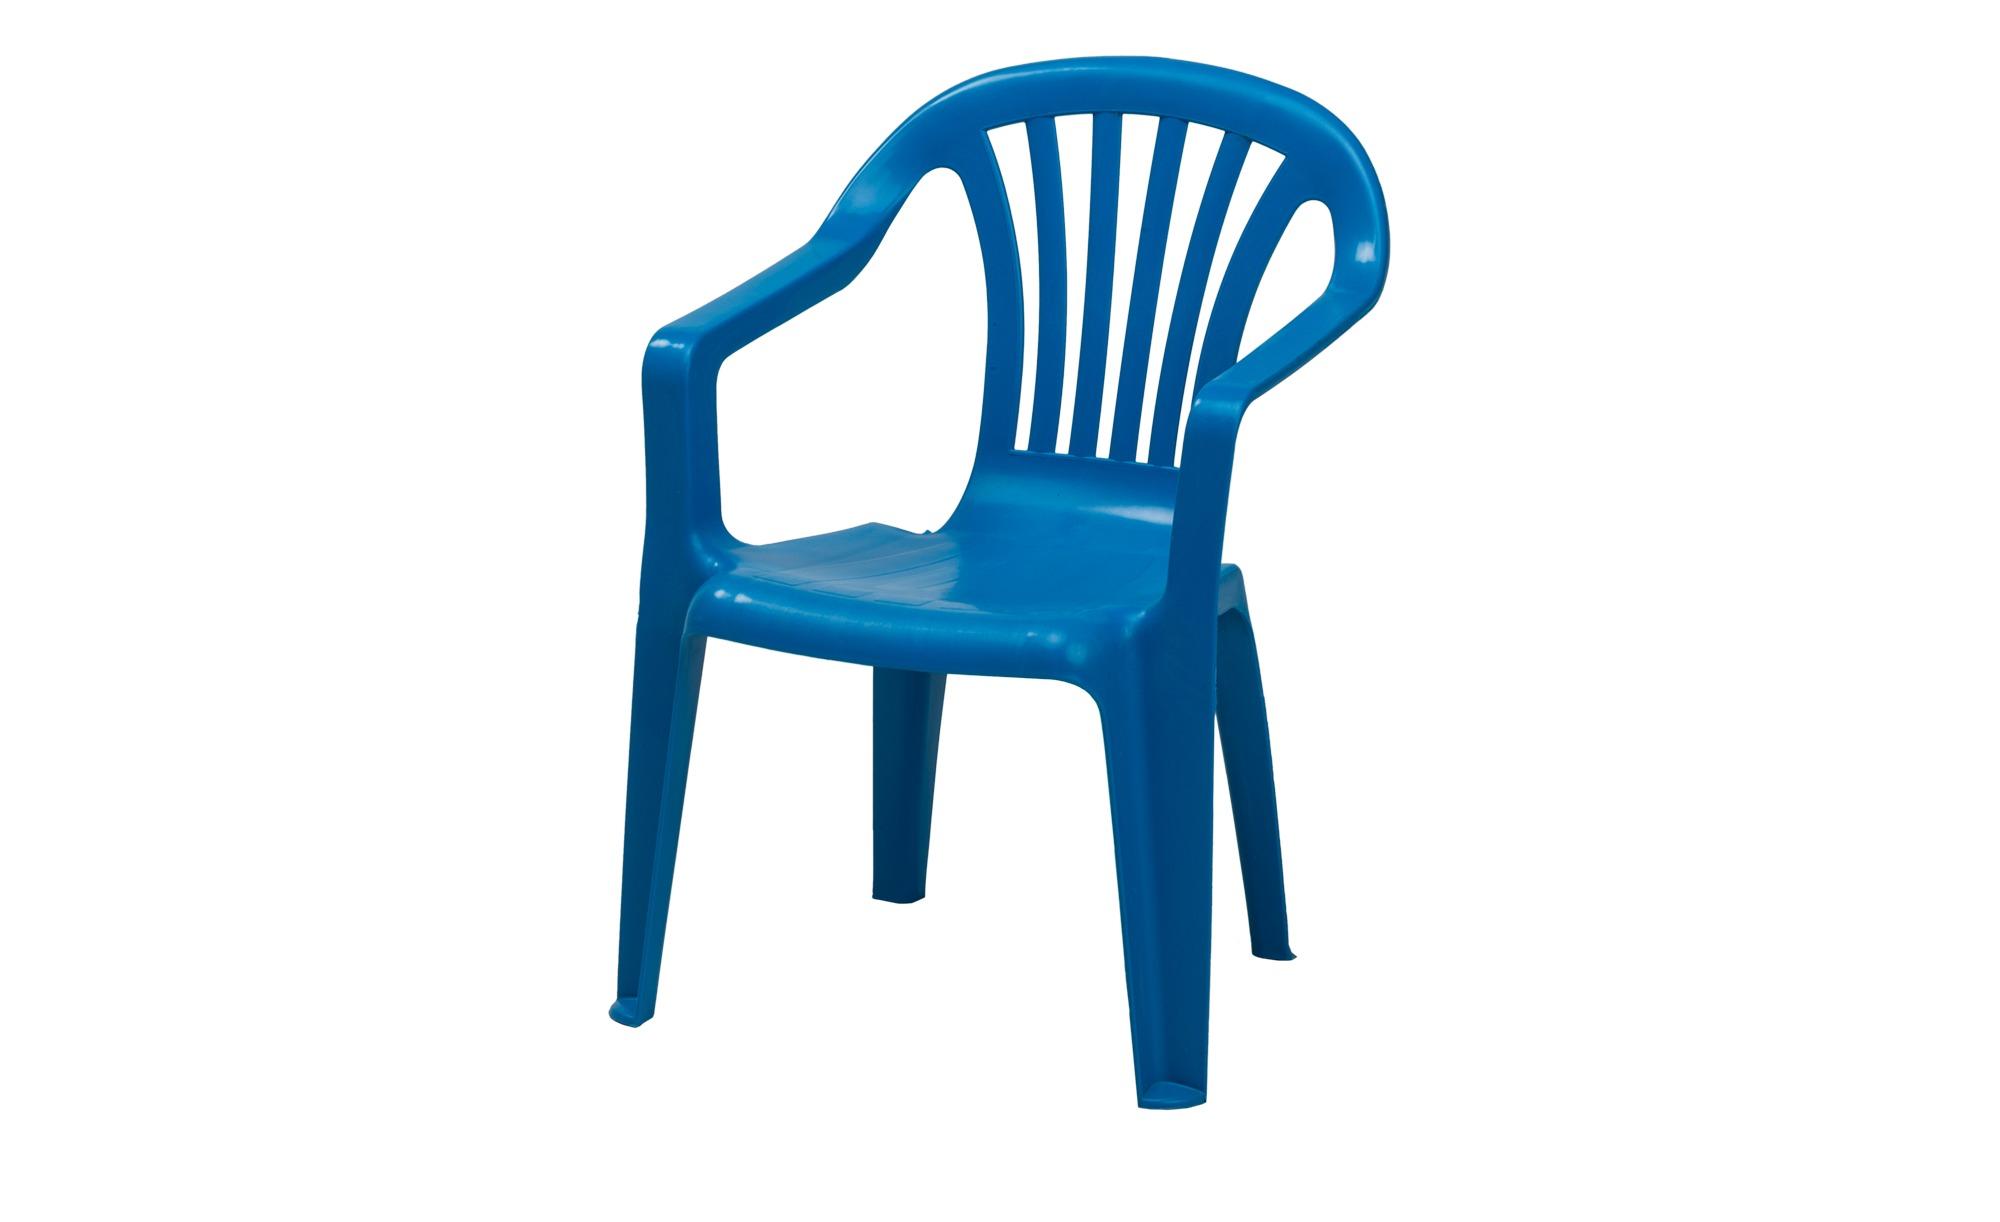 Blauer Kinder-Stapelsessel aus Kunststoff